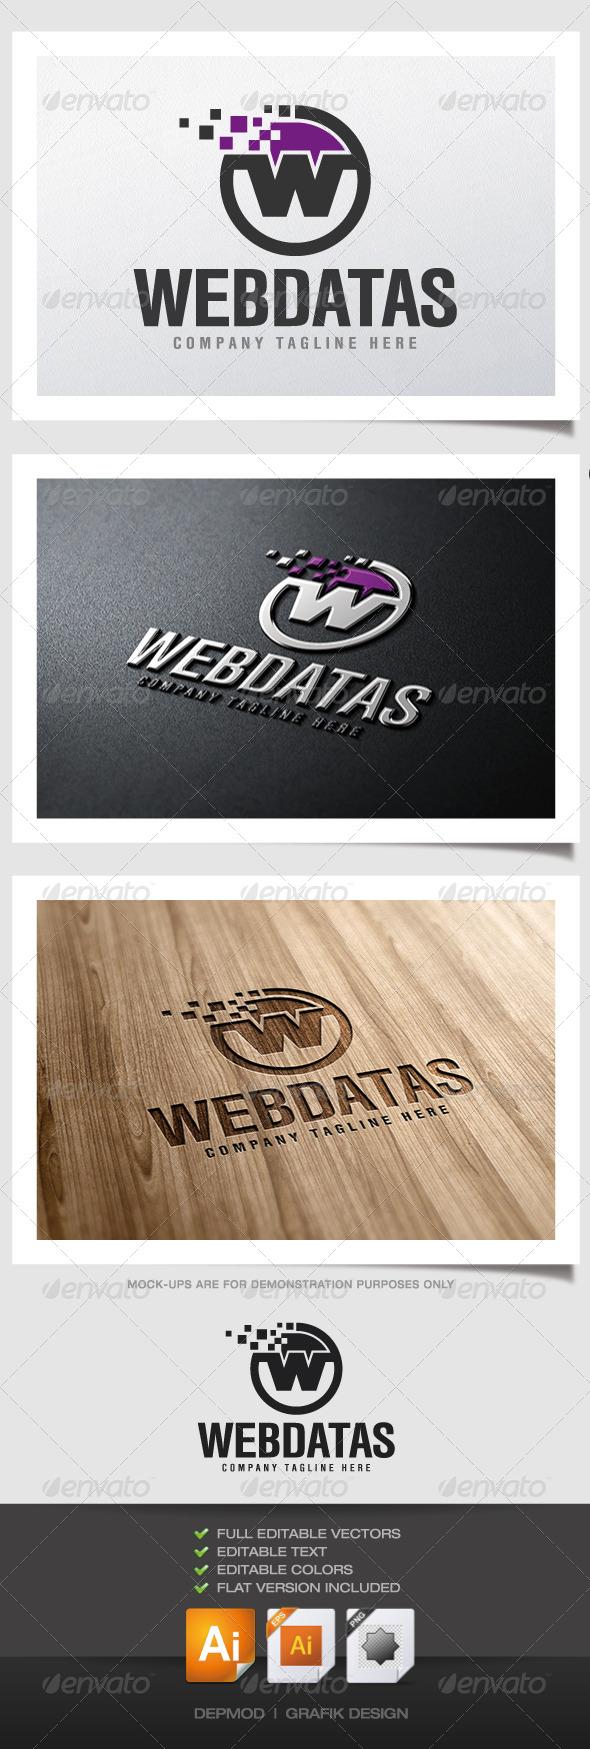 Web Datas Logo - Letters Logo Templates